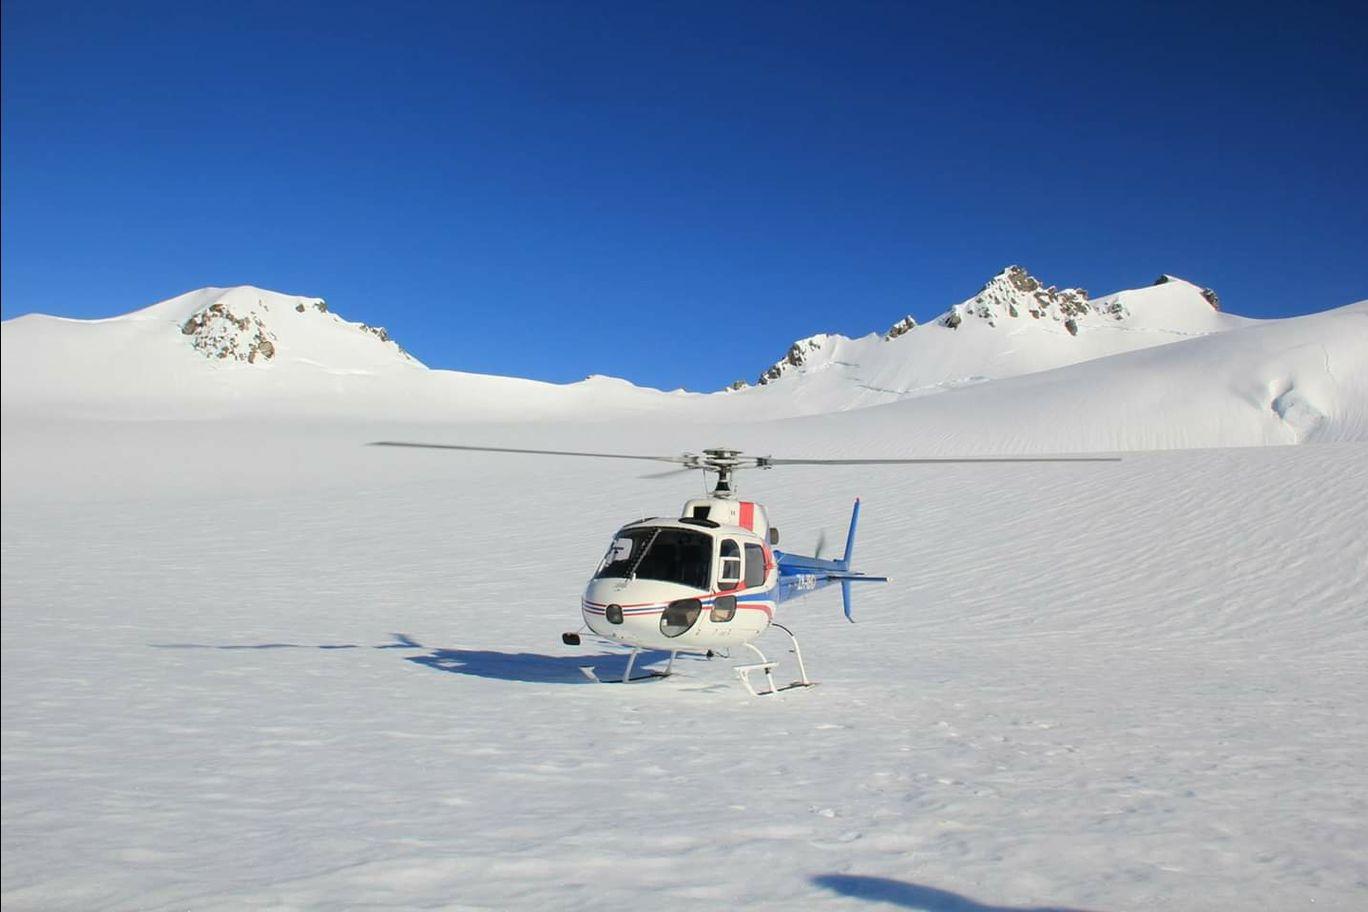 Photo of Franz Josef Glacier By Rahul Miglani